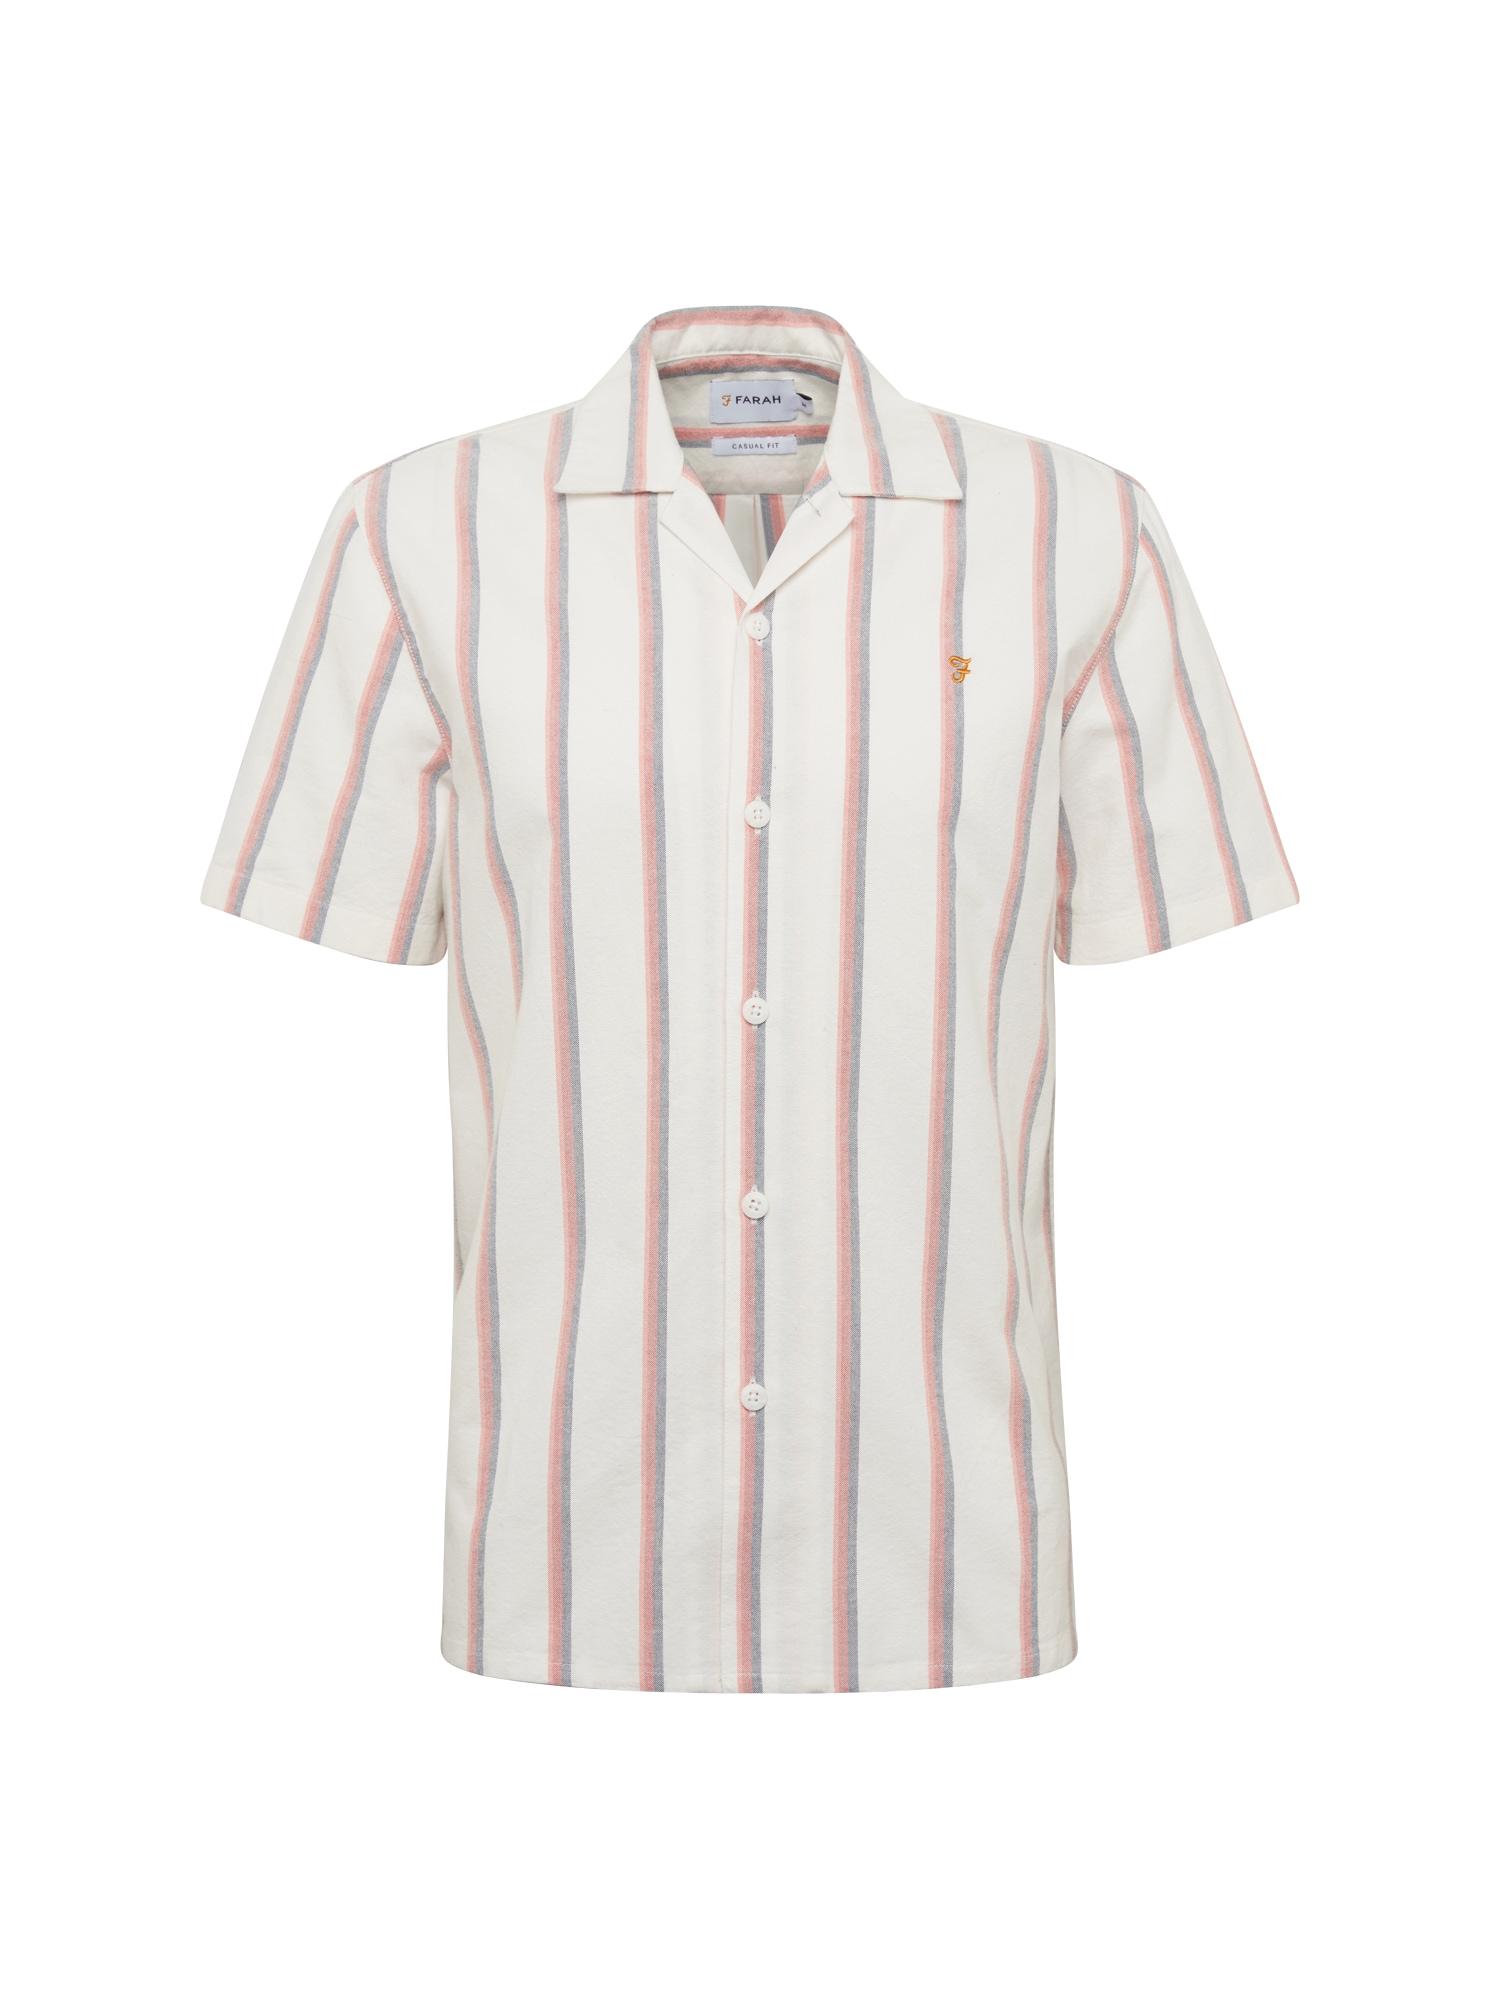 Košile SAUNDERSON červená bílá FARAH